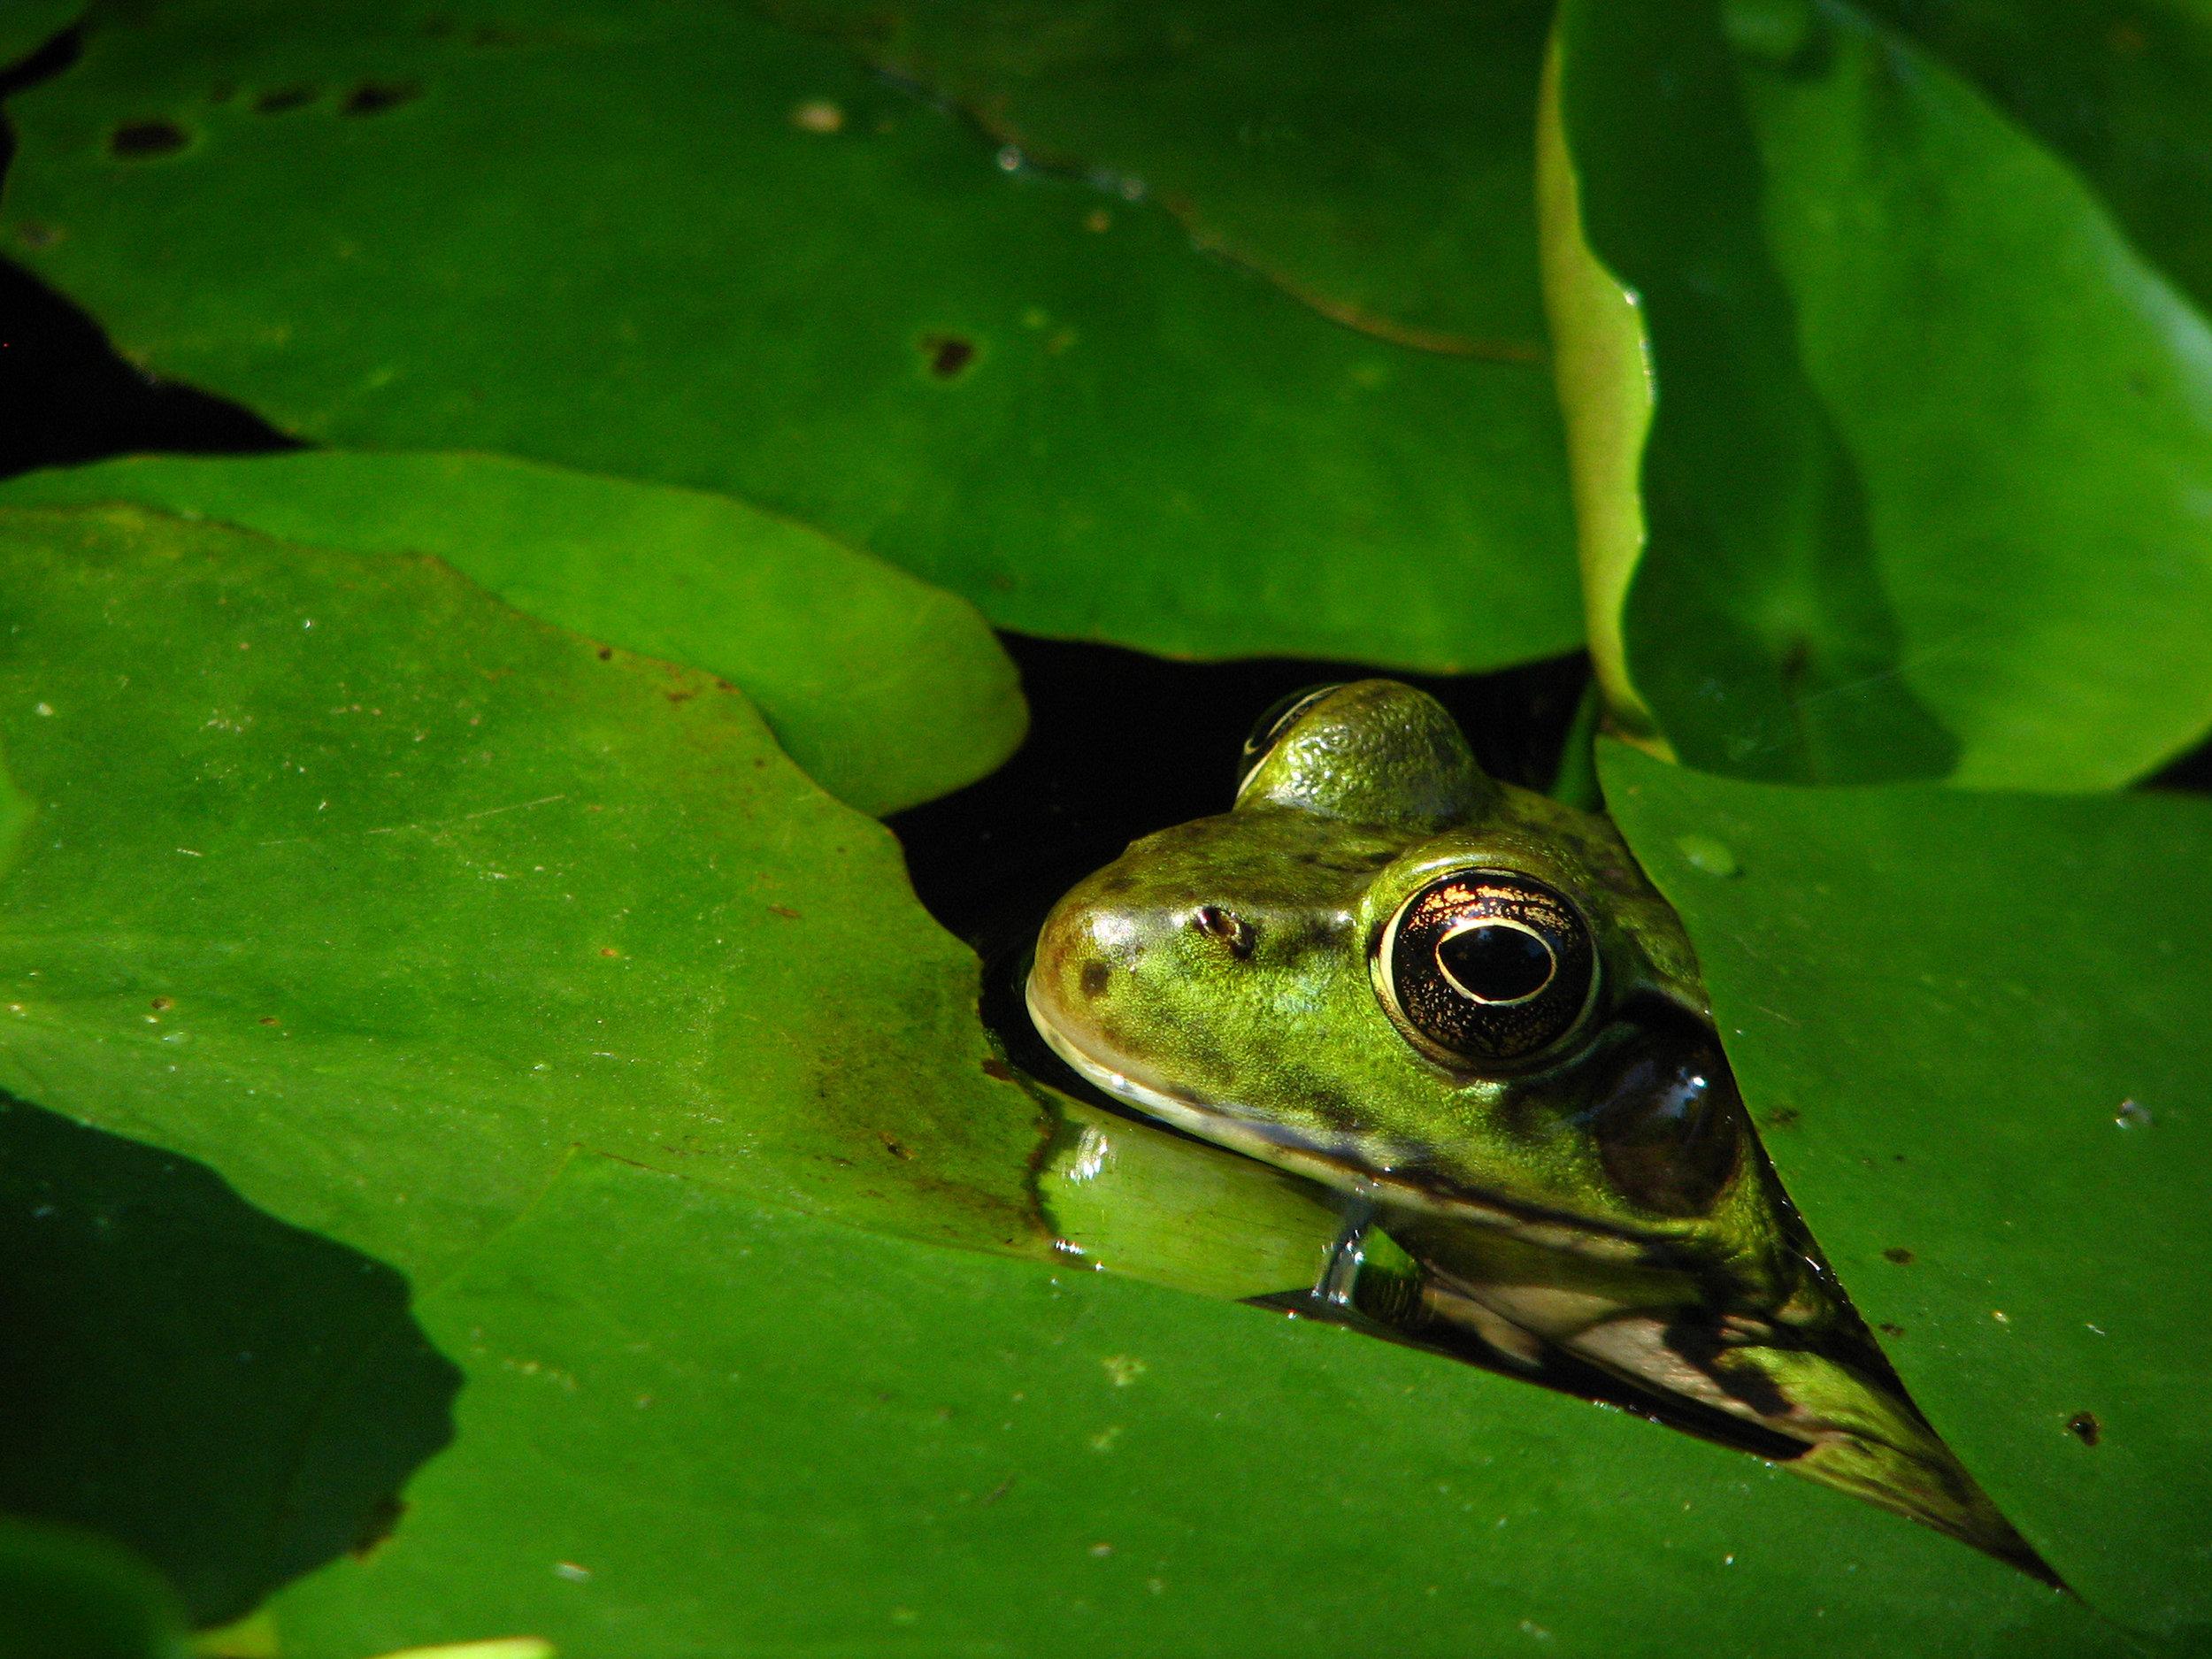 frogs pond 029 copy.jpg